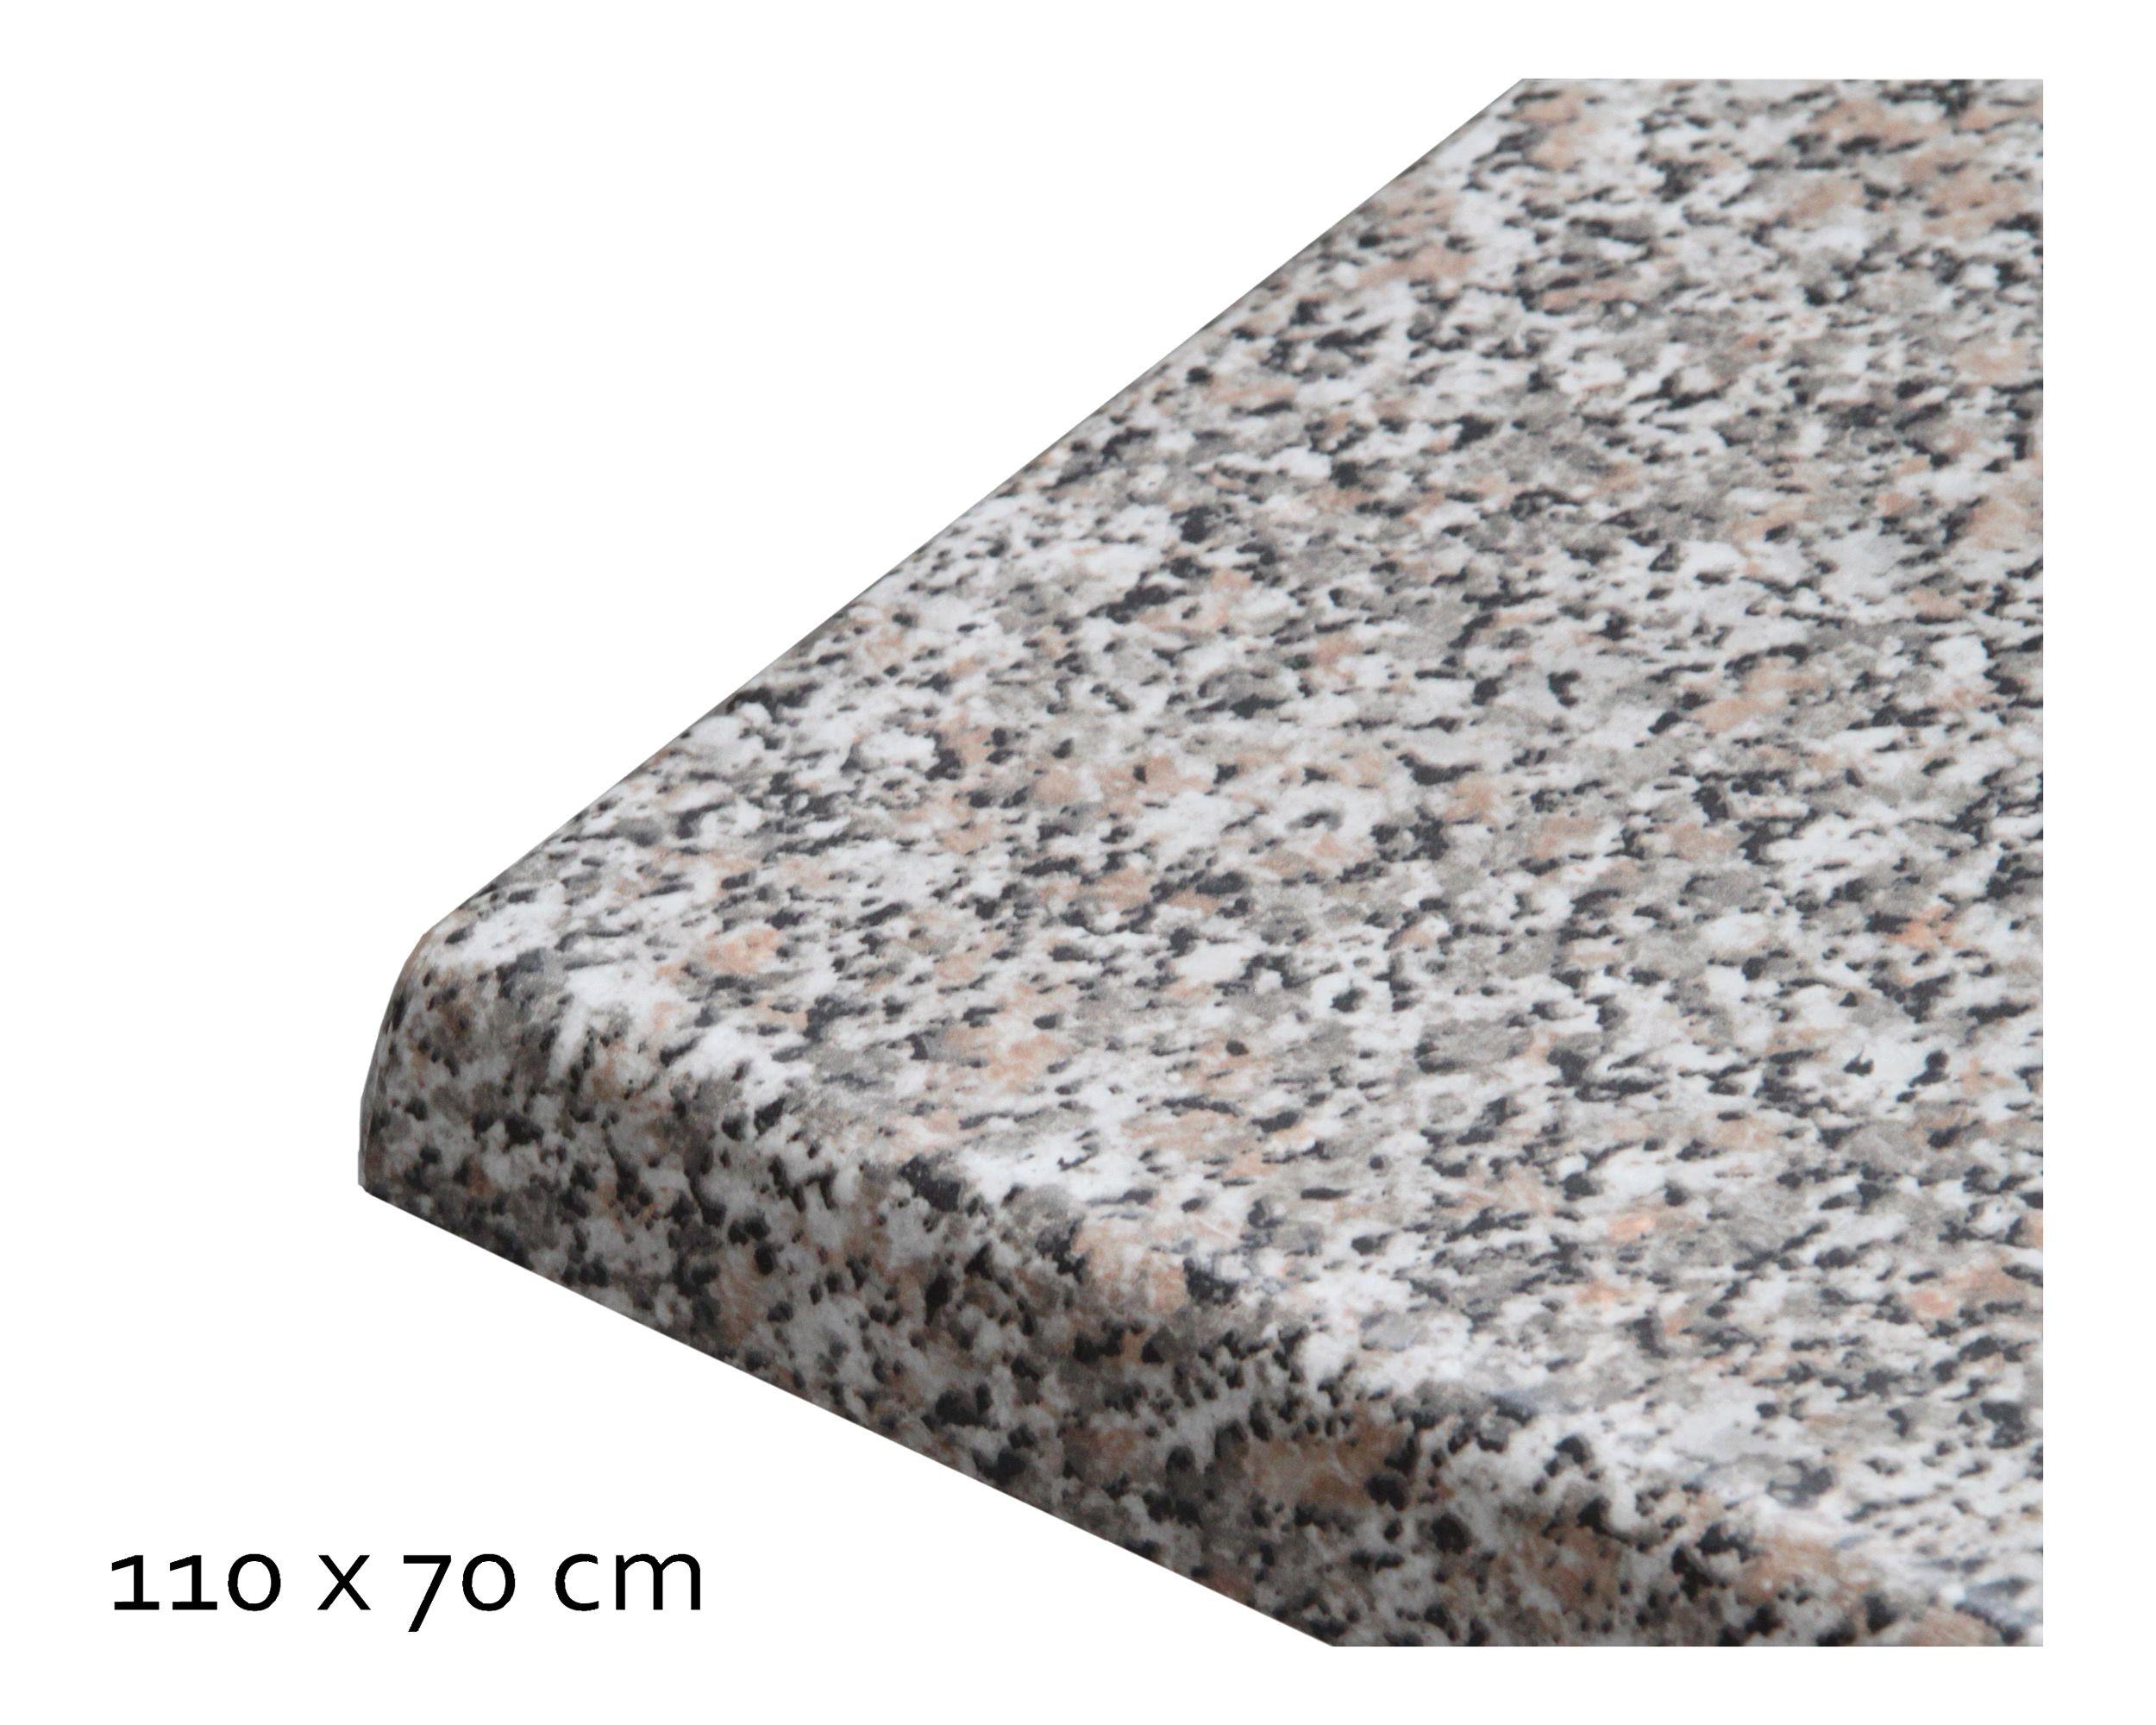 Tischplatte Topalit Standard, 70x110 cm